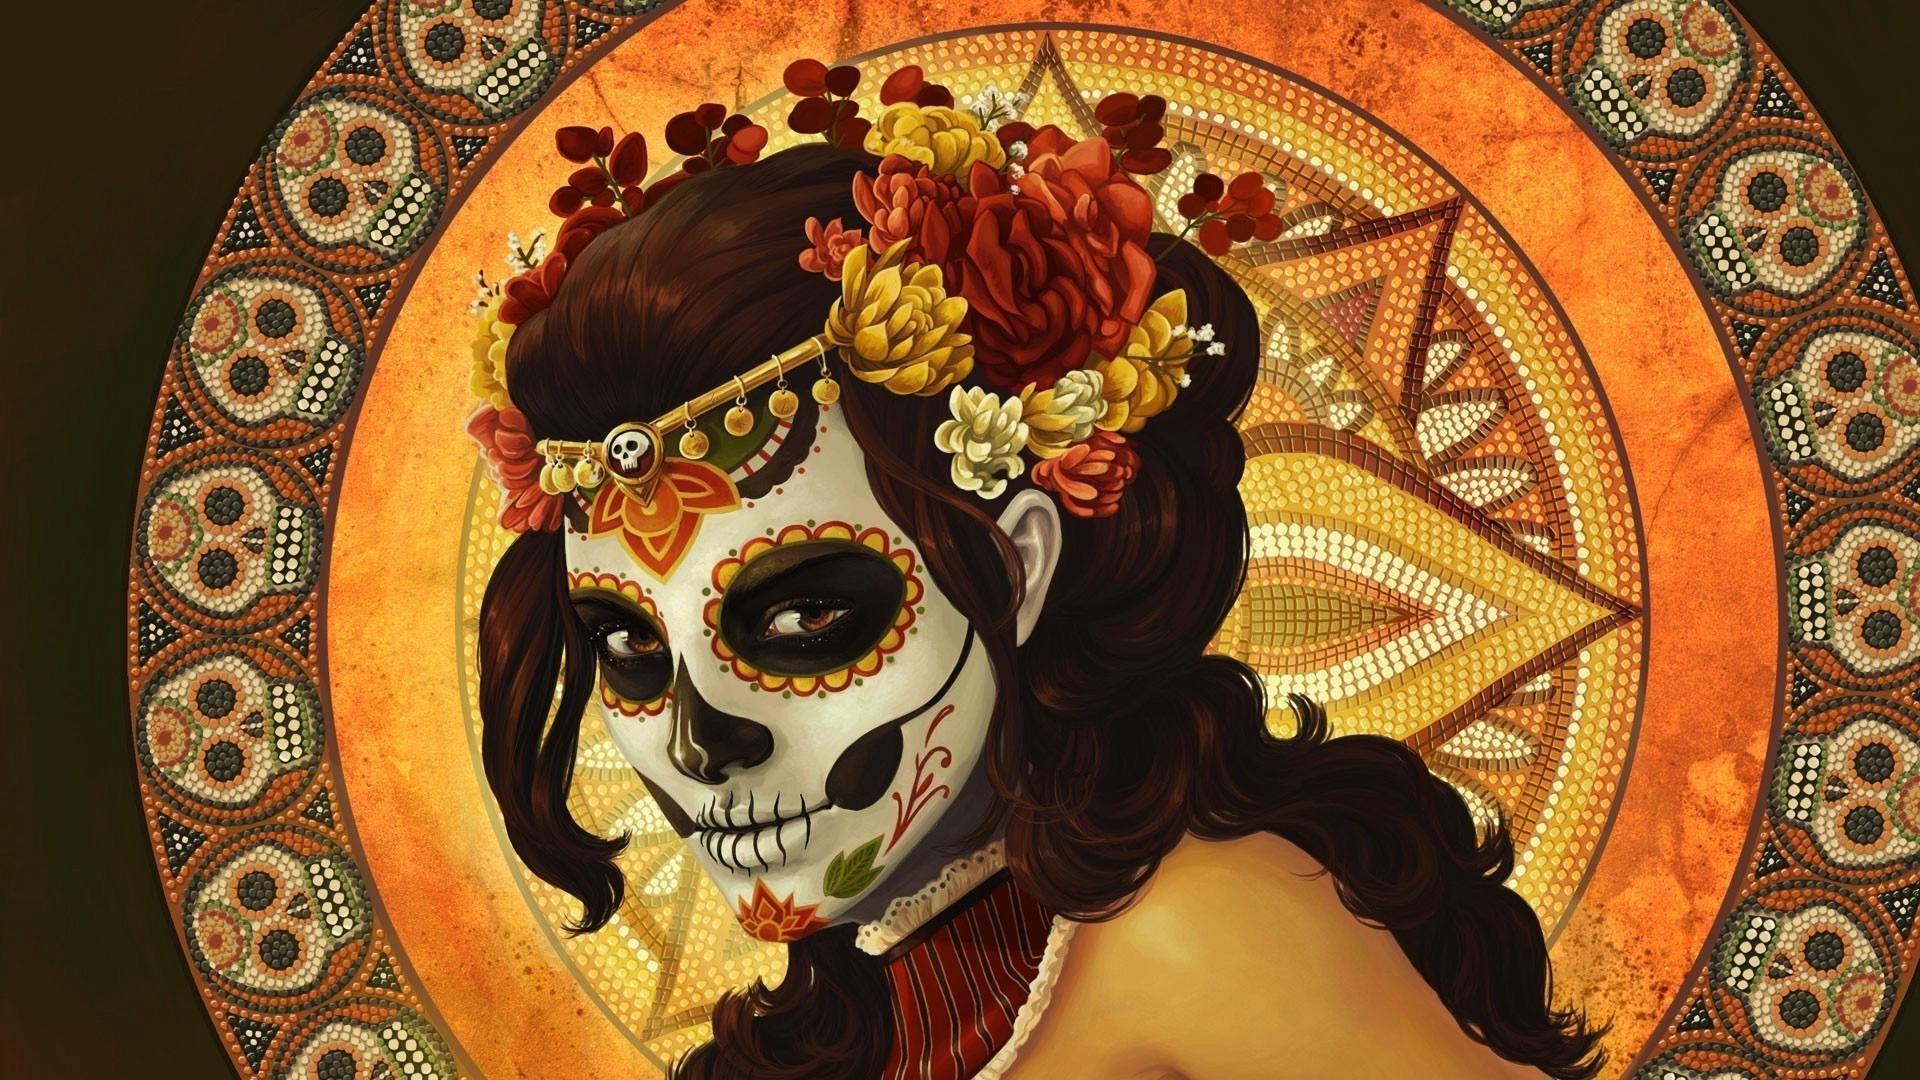 MythDancer   Bringing Myths to the Modern World: Halloween: Tricks, Treats,  and Pagan Rituals